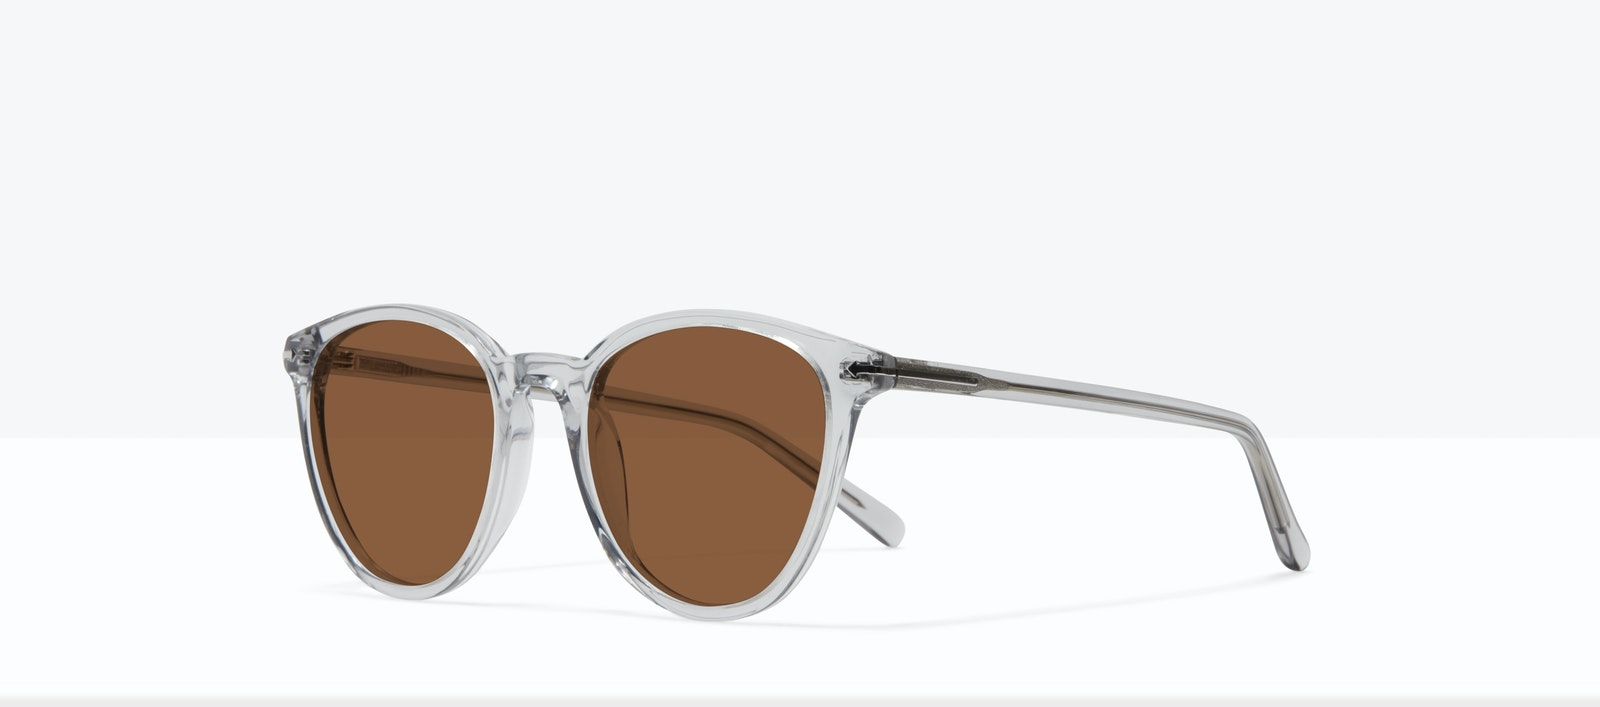 Affordable Fashion Glasses Round Sunglasses Women London Taupe Tilt